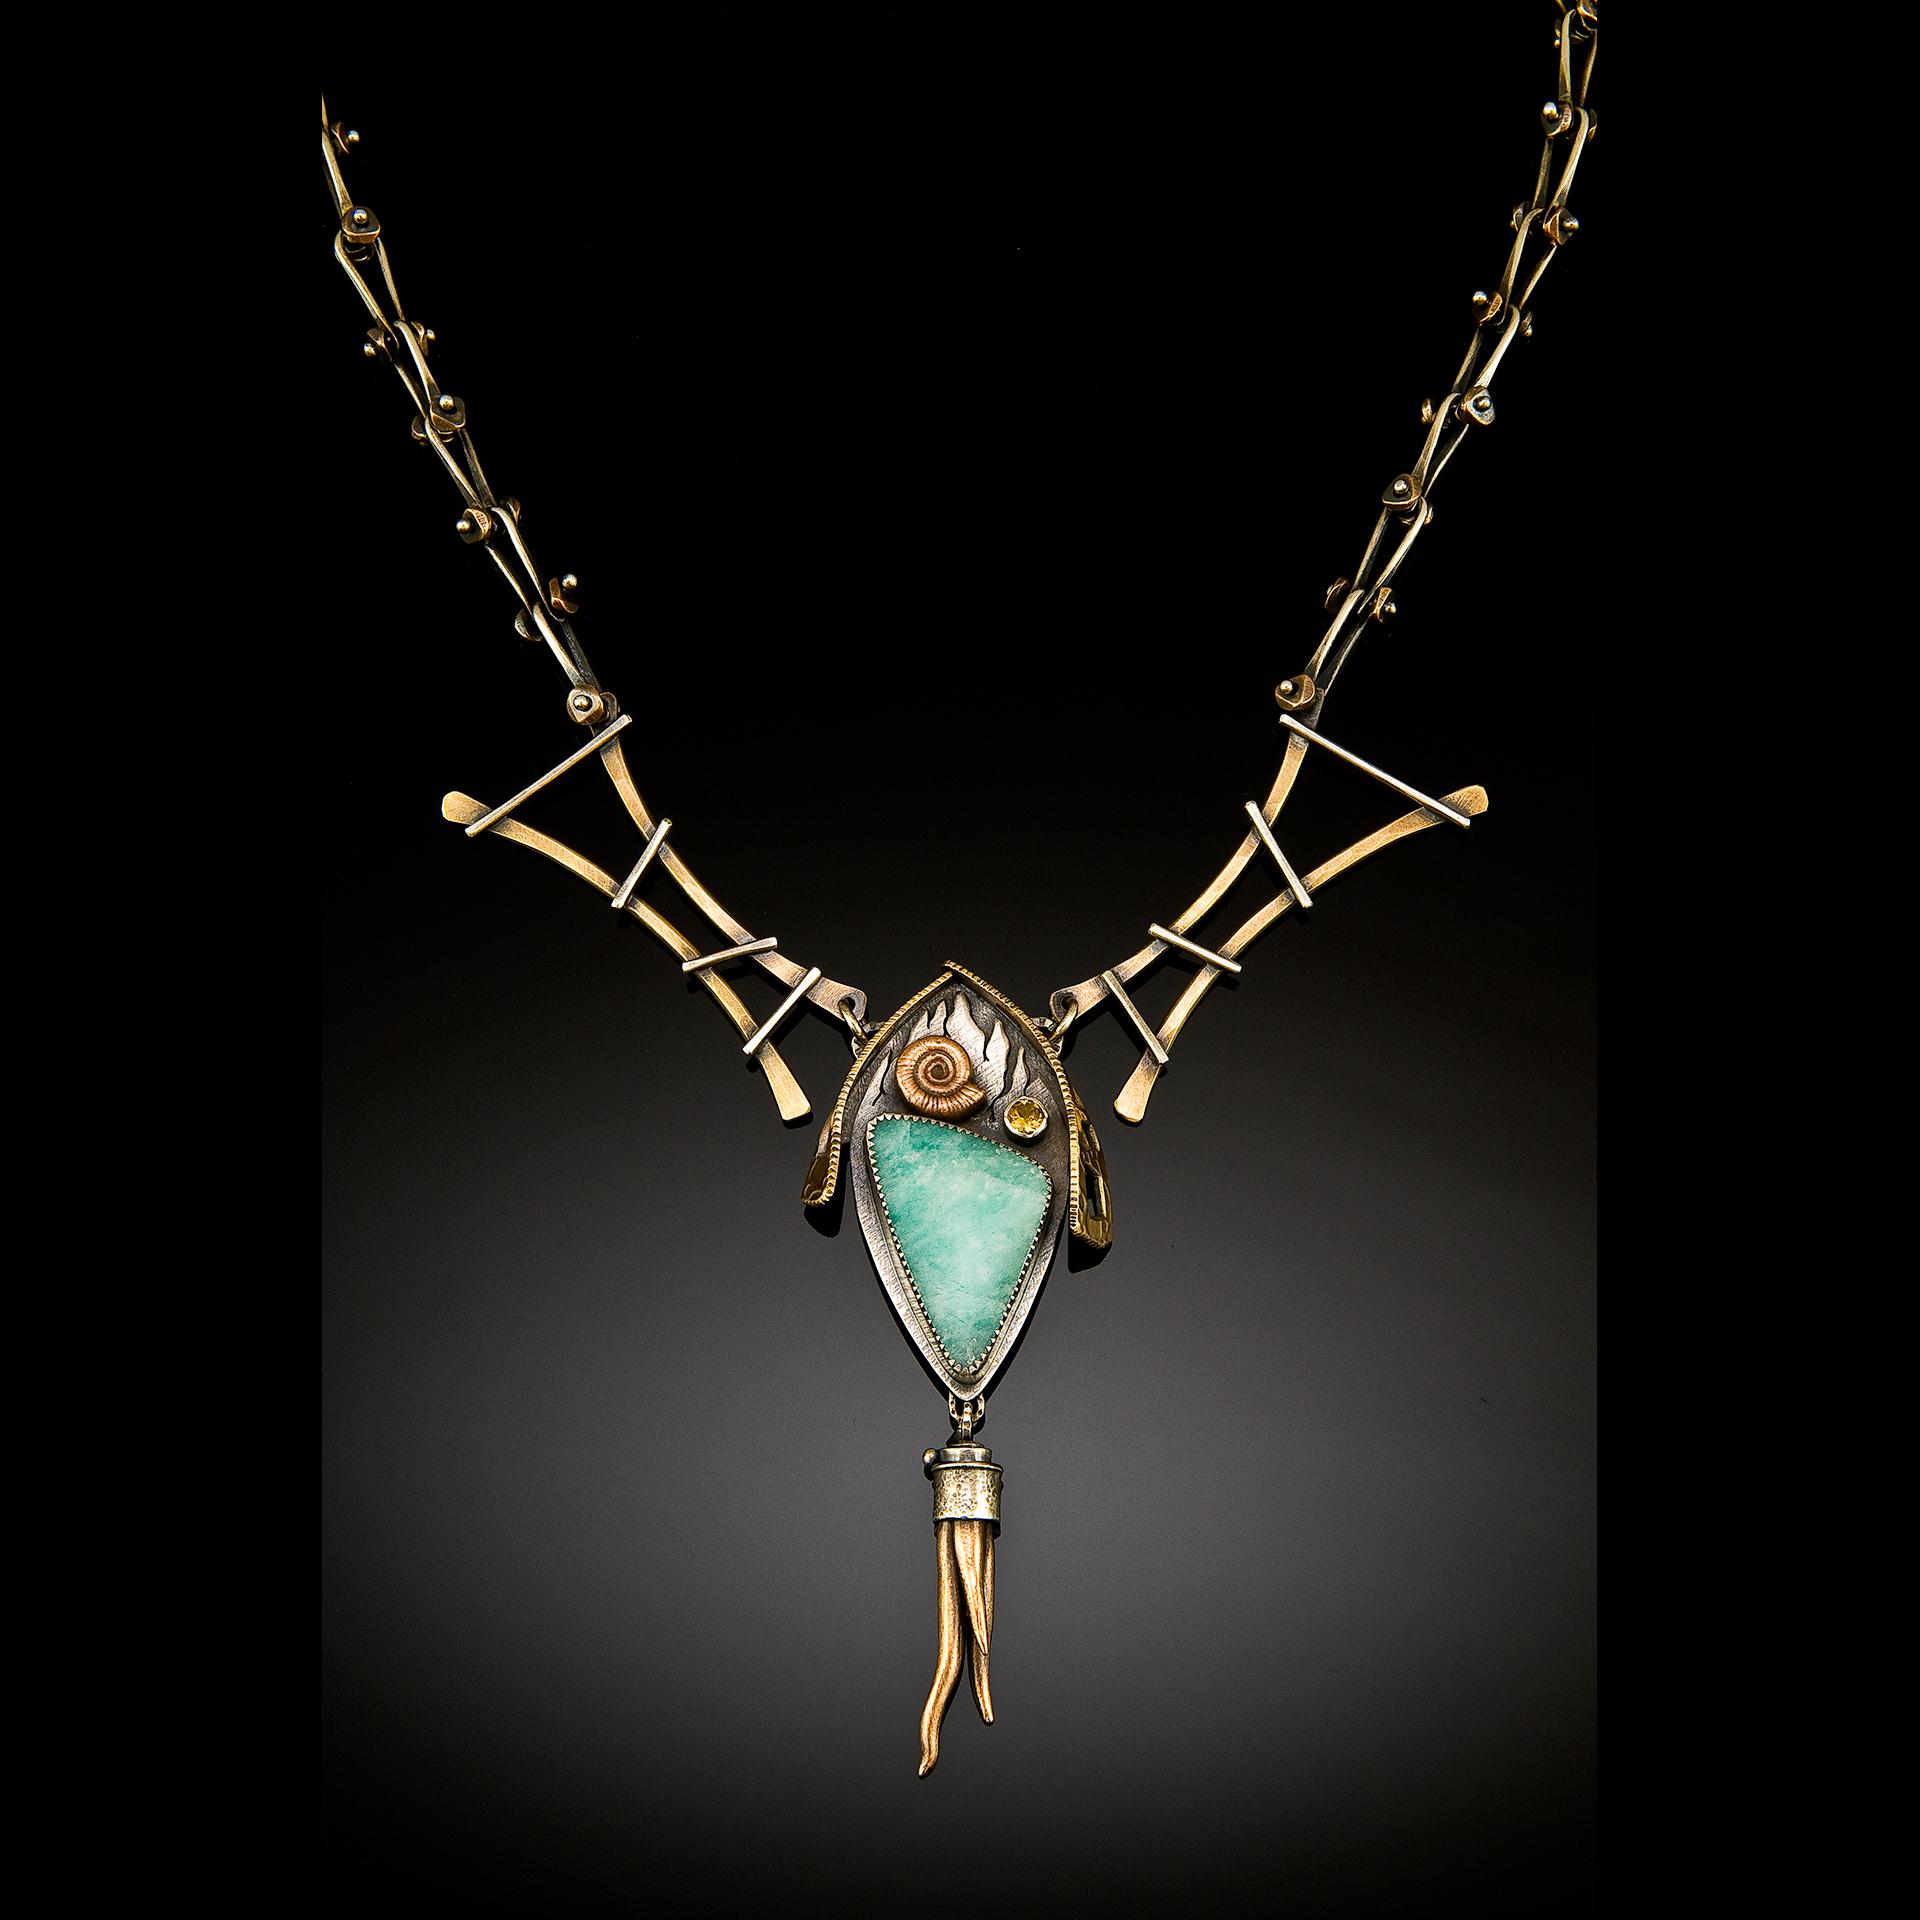 Pacific Northwest Jewelry Artist Una Barrett Necklace BAMArts Fair 2018